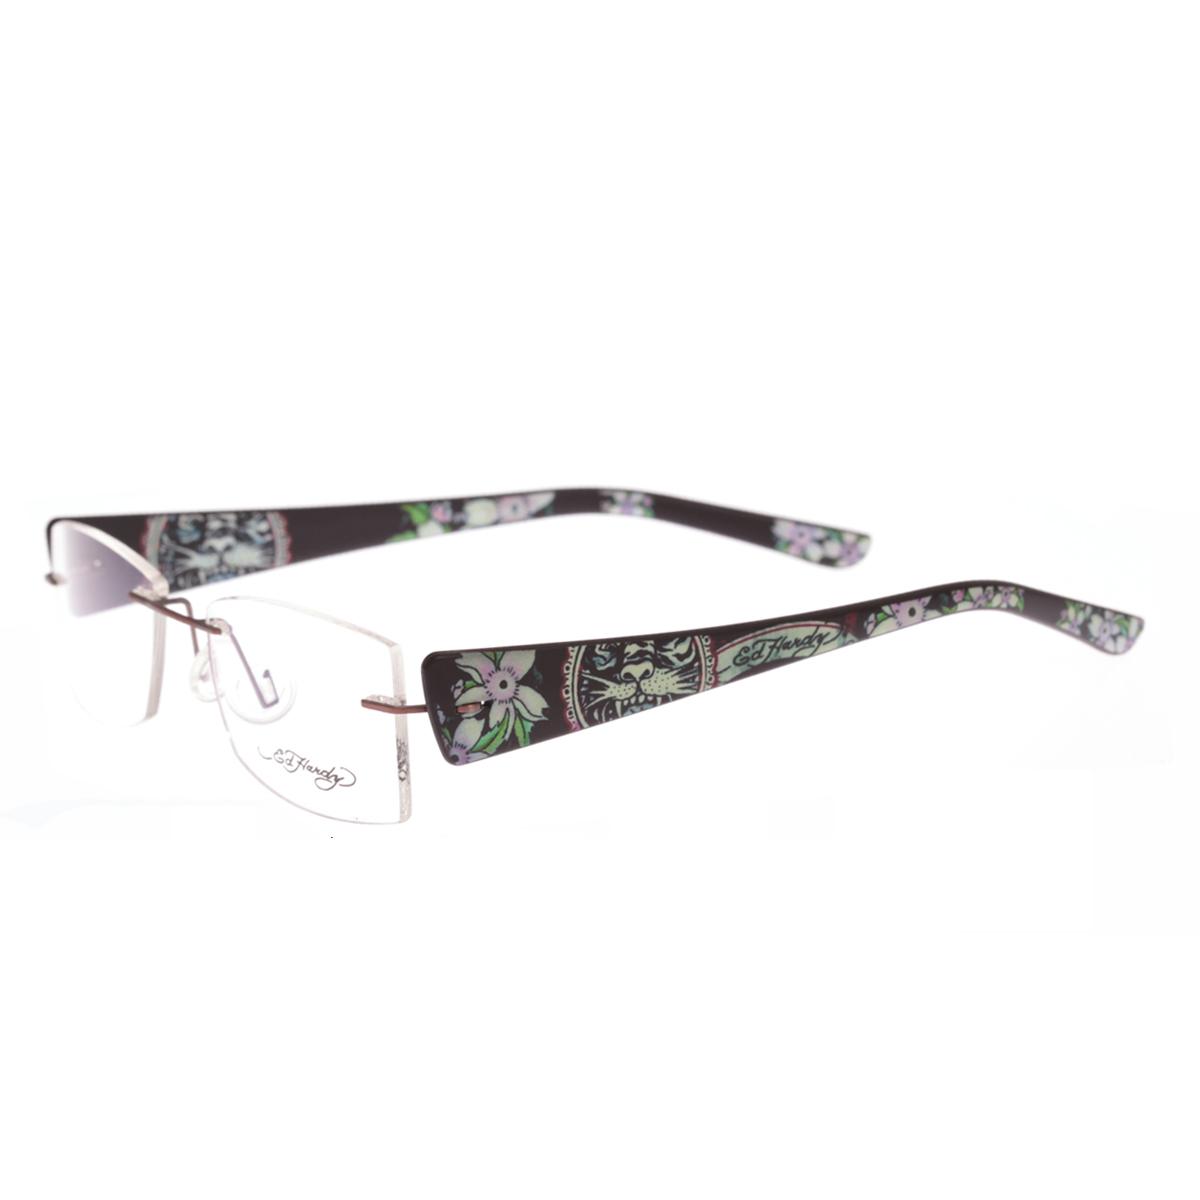 Ed Hardy Lites Eyeglasses Frames : Ed Hardy EHL-814 Lite Designer Eyeglasses eBay